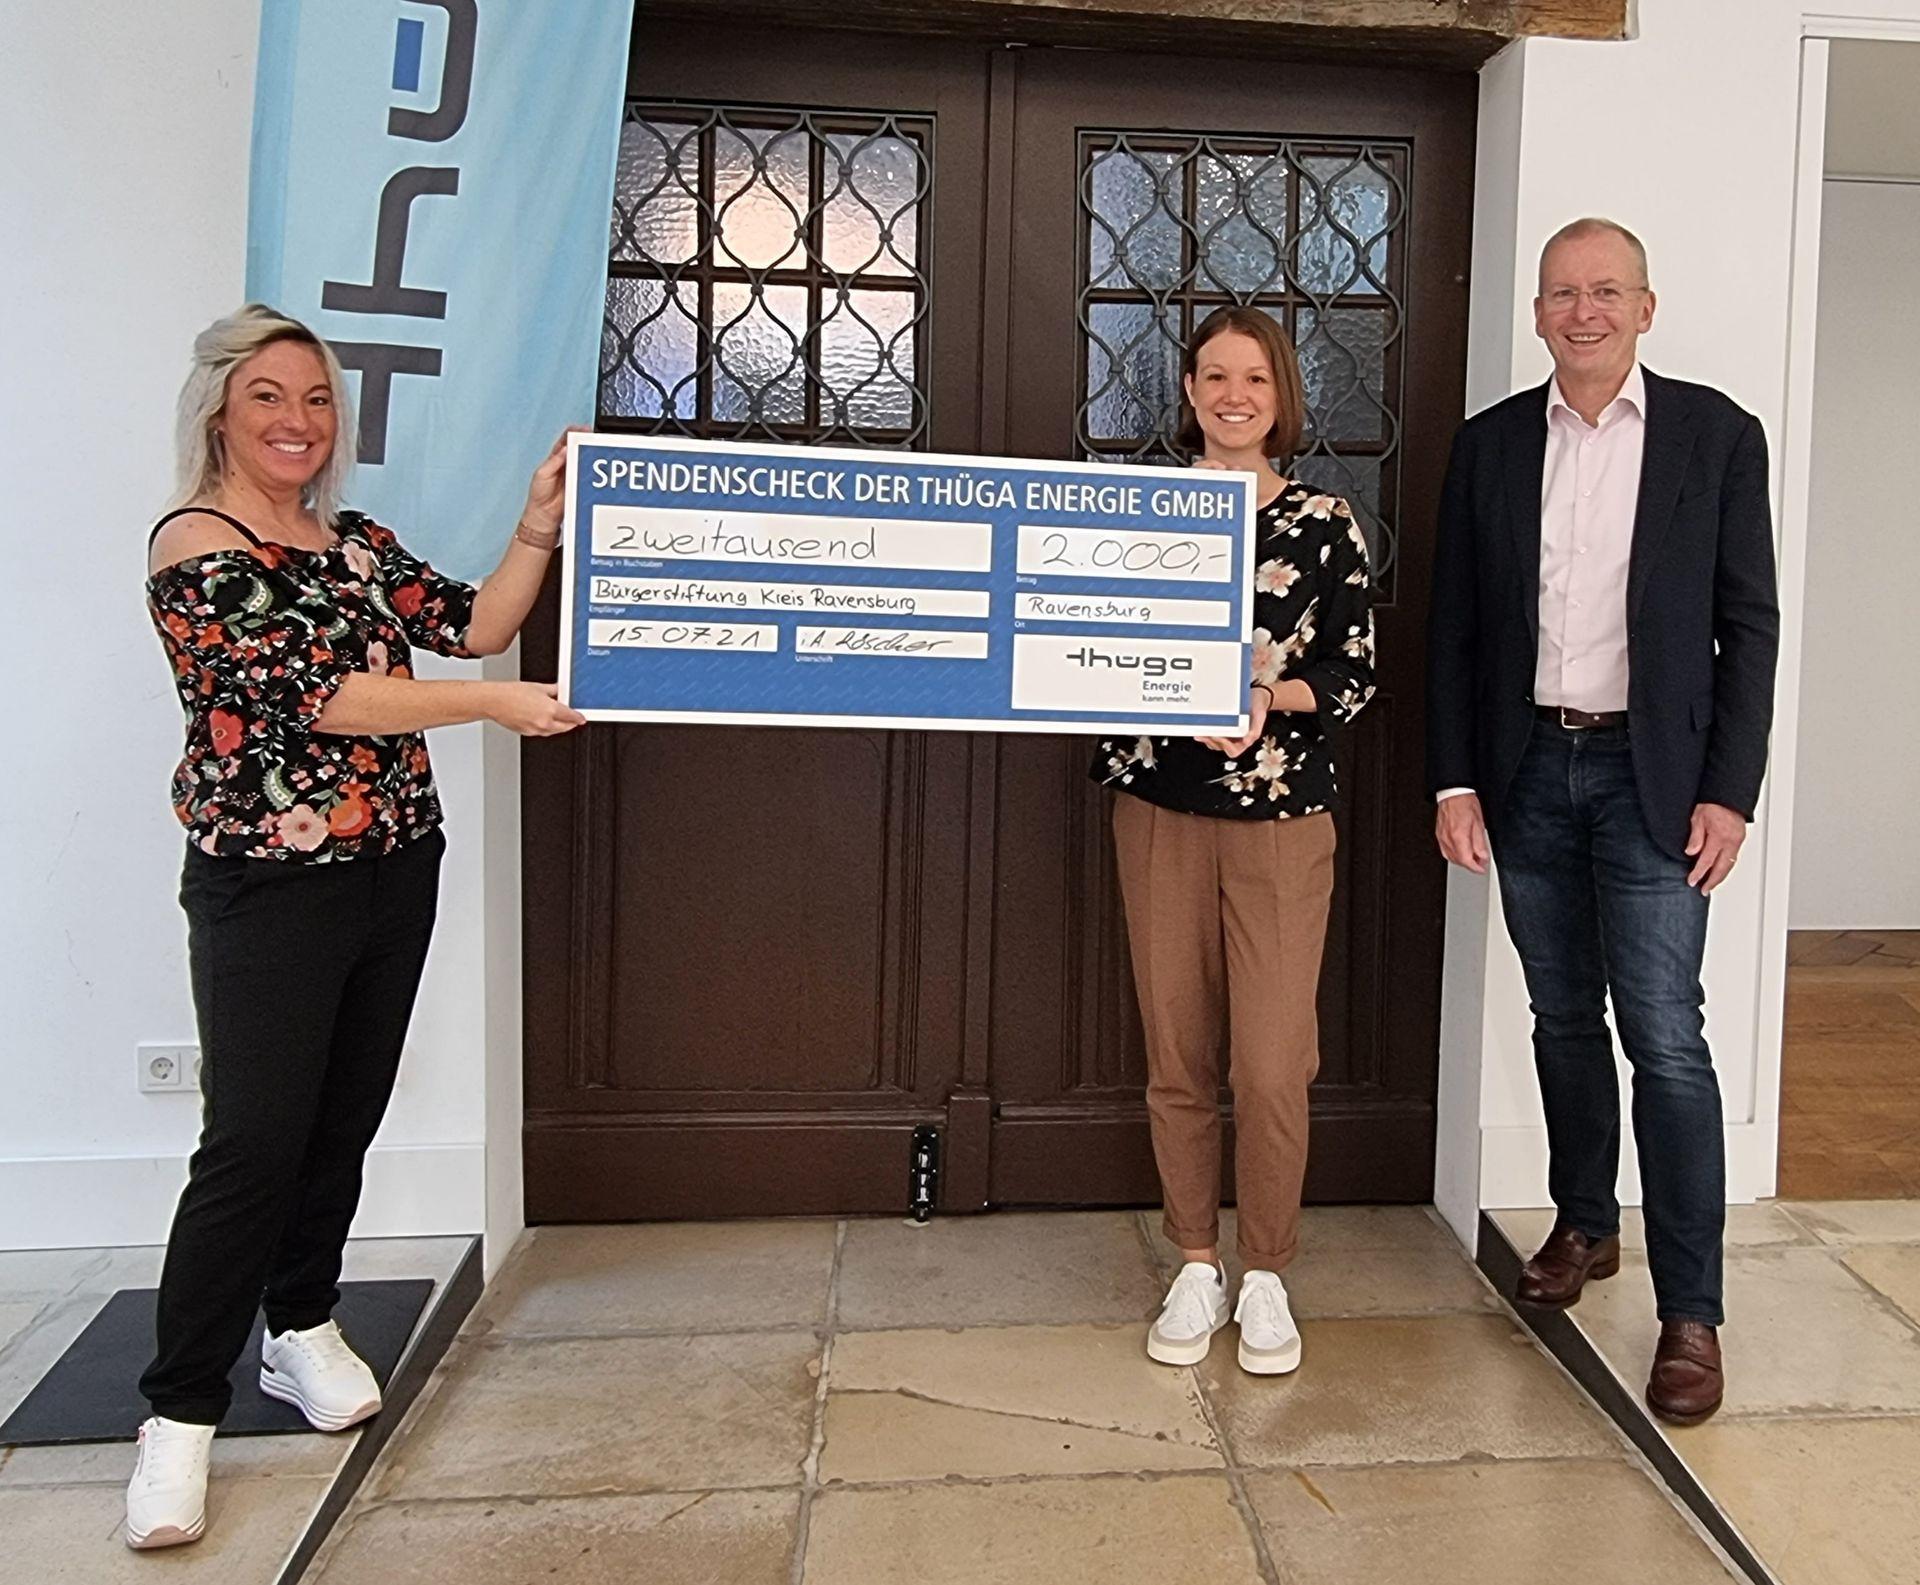 Thüga Energie spendet 2.000 Euro an Bürgerstiftung Kreis Ravensburg